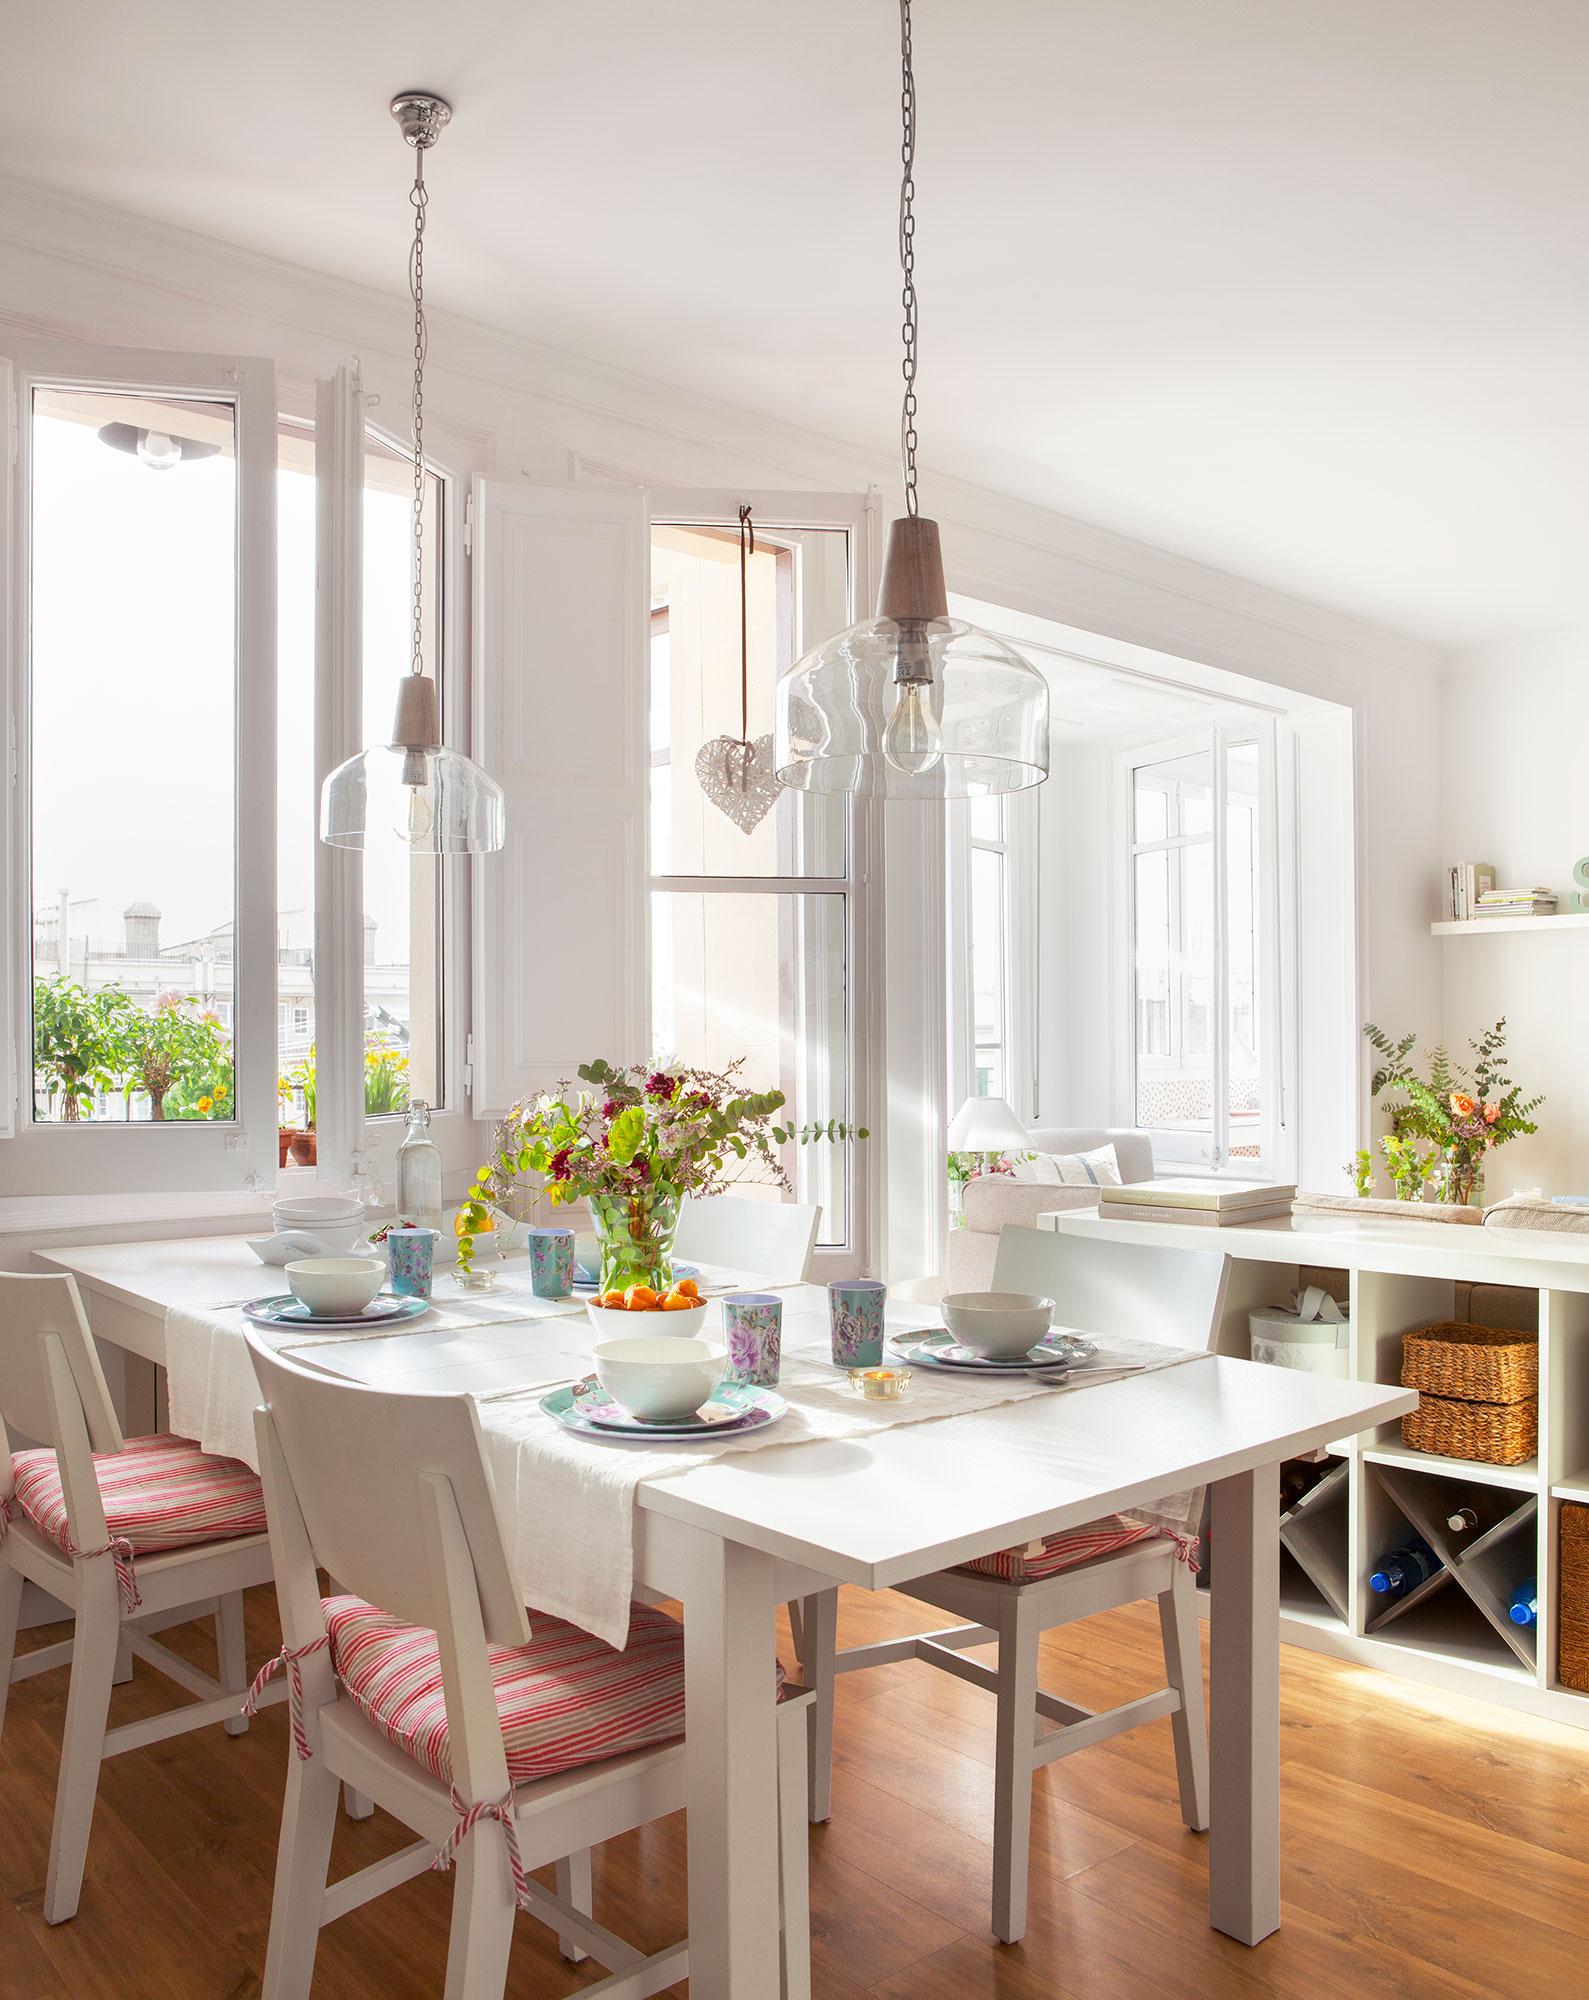 Mesas de comedor c mo elegir tu mesa de comedor perfecta for Mesas de comedor de madera de diseno